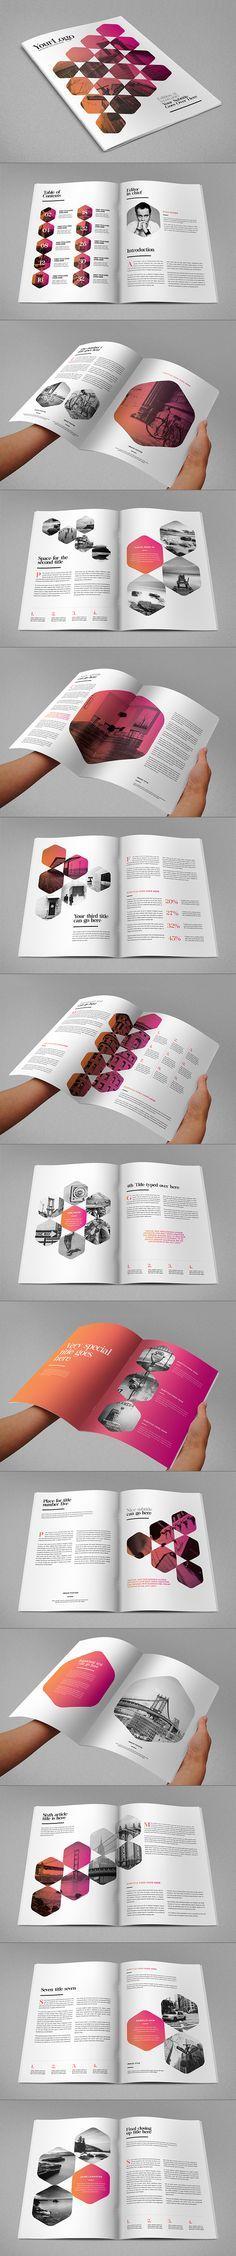 Minimal Modern Clean Magazine. Download here: http://graphicriver.net/item/minimal-modern-clean-magazine/11295103?ref=abradesign #design #magazine Latest Modern Web Designs. http://webworksagency.com